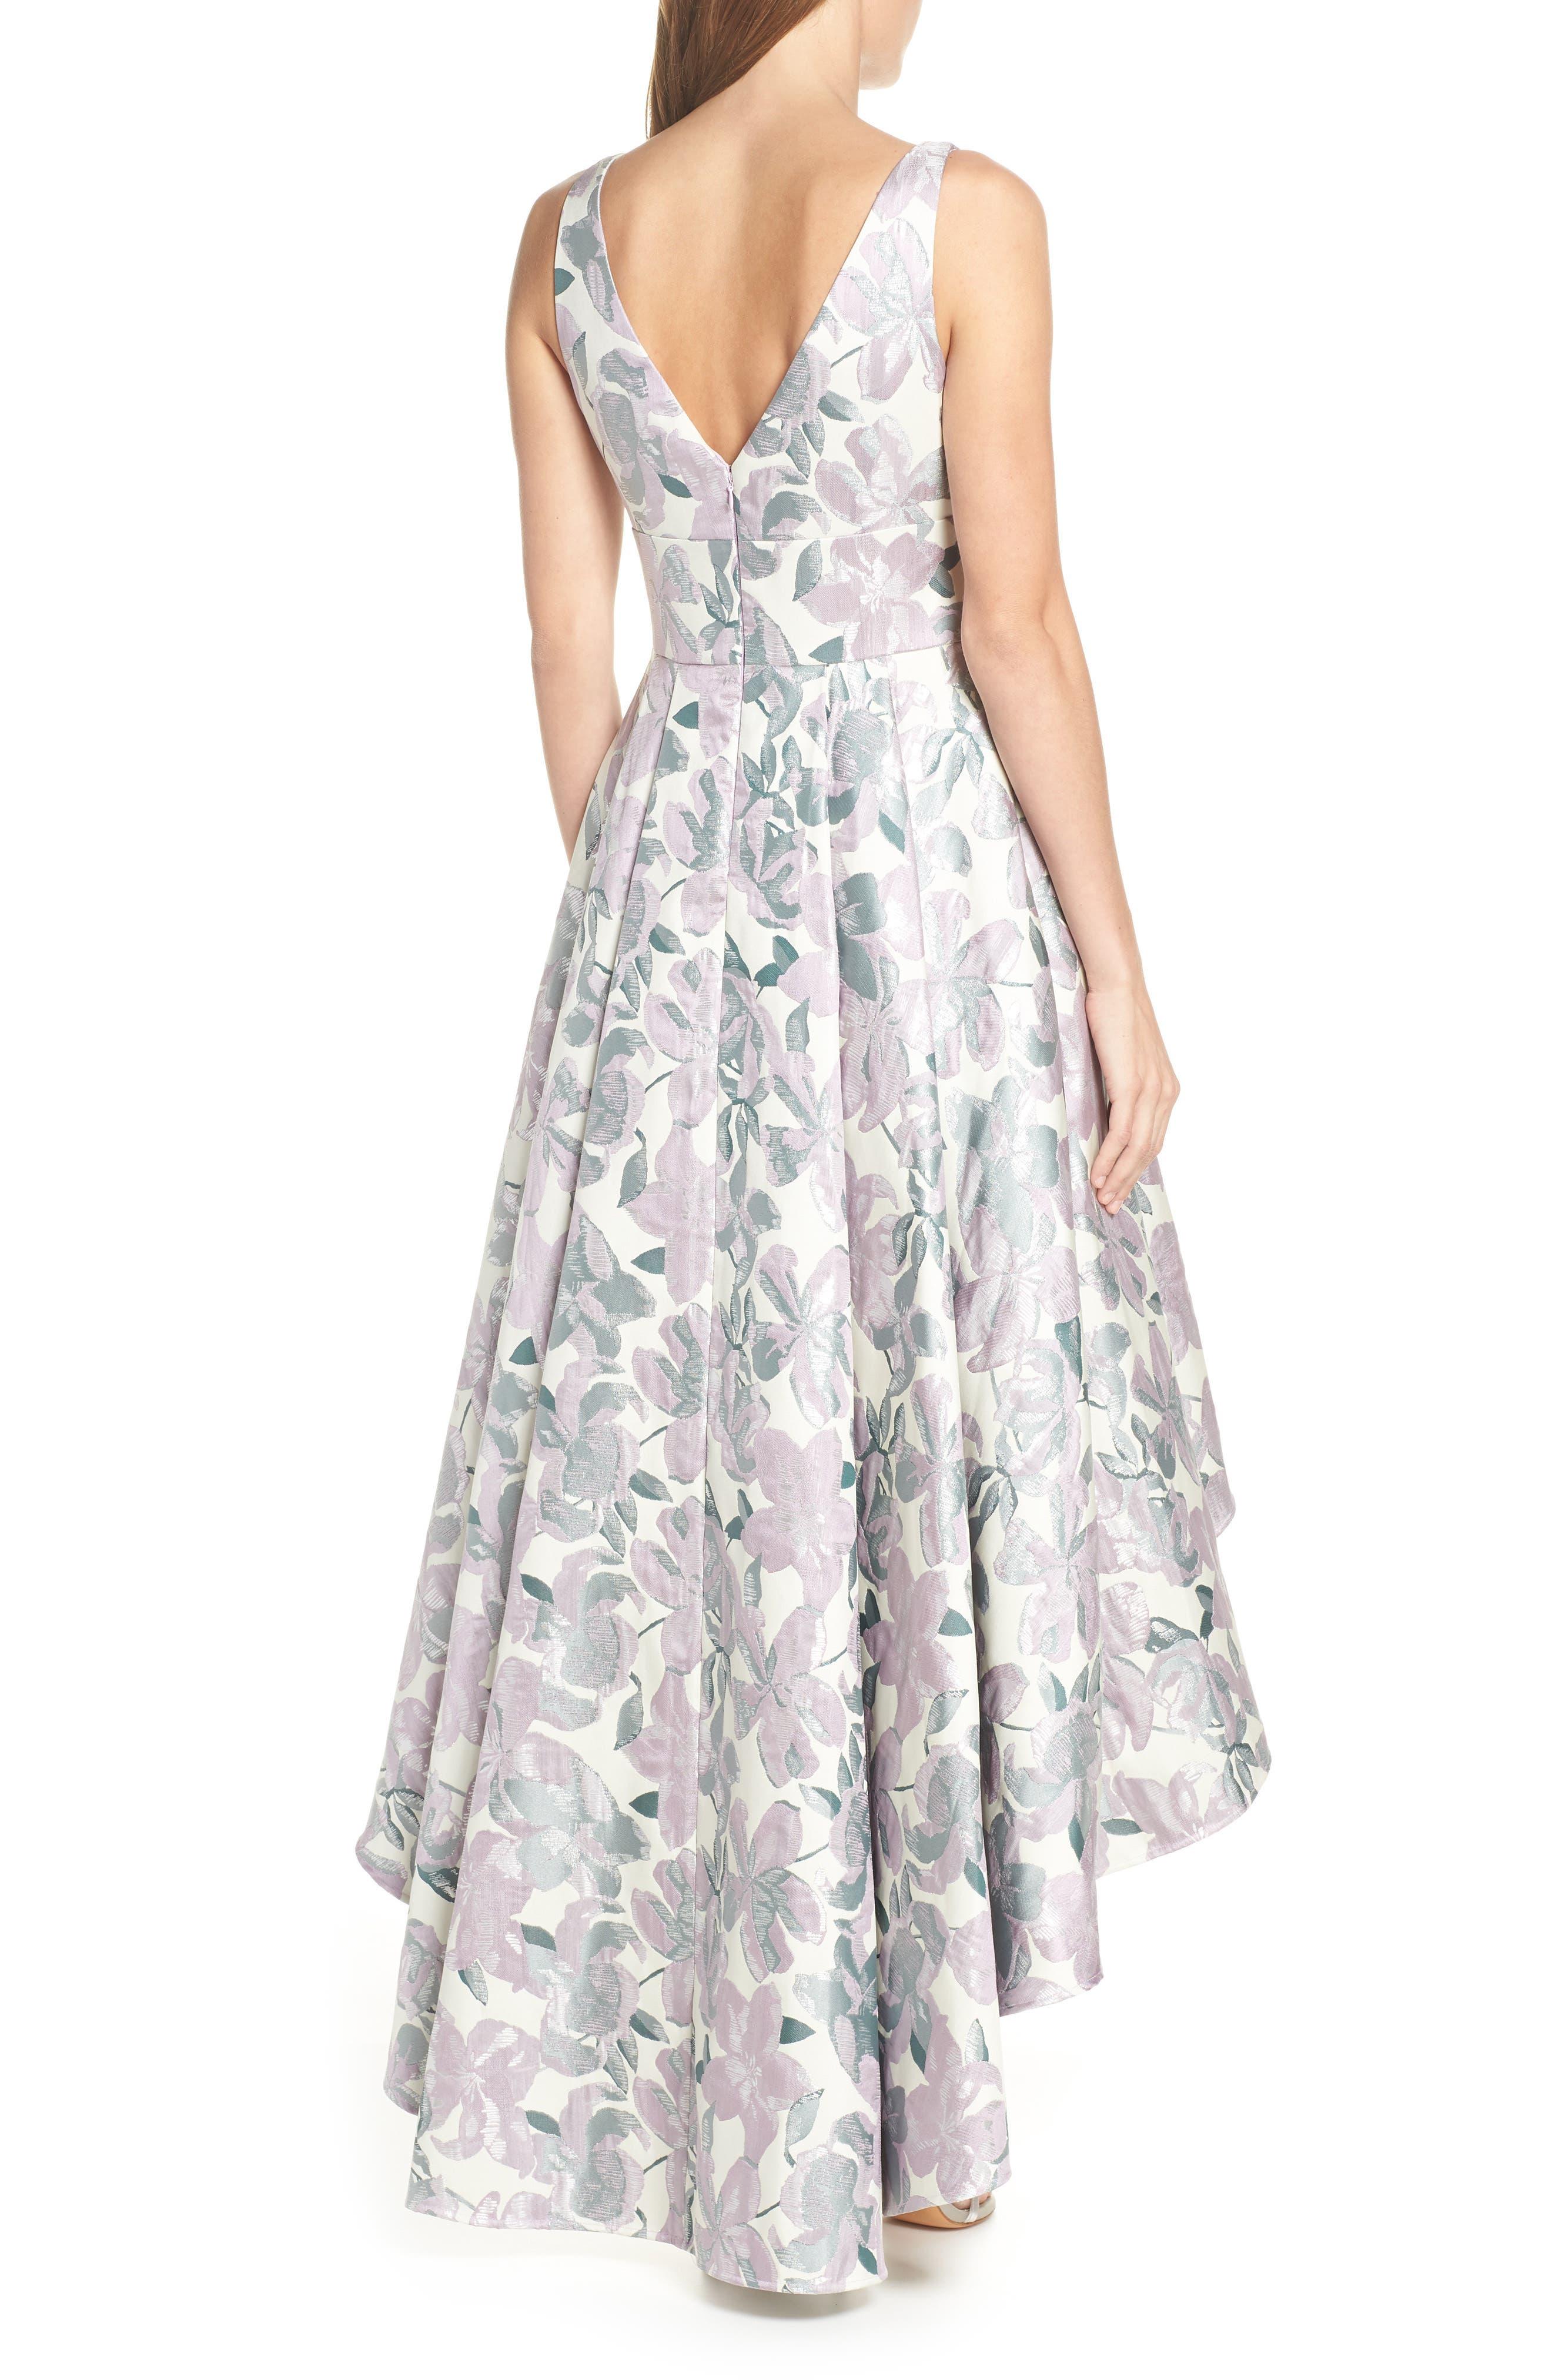 Floral Jacquard High/Low Evening Dress,                             Alternate thumbnail 2, color,                             LILAC COMBINATION